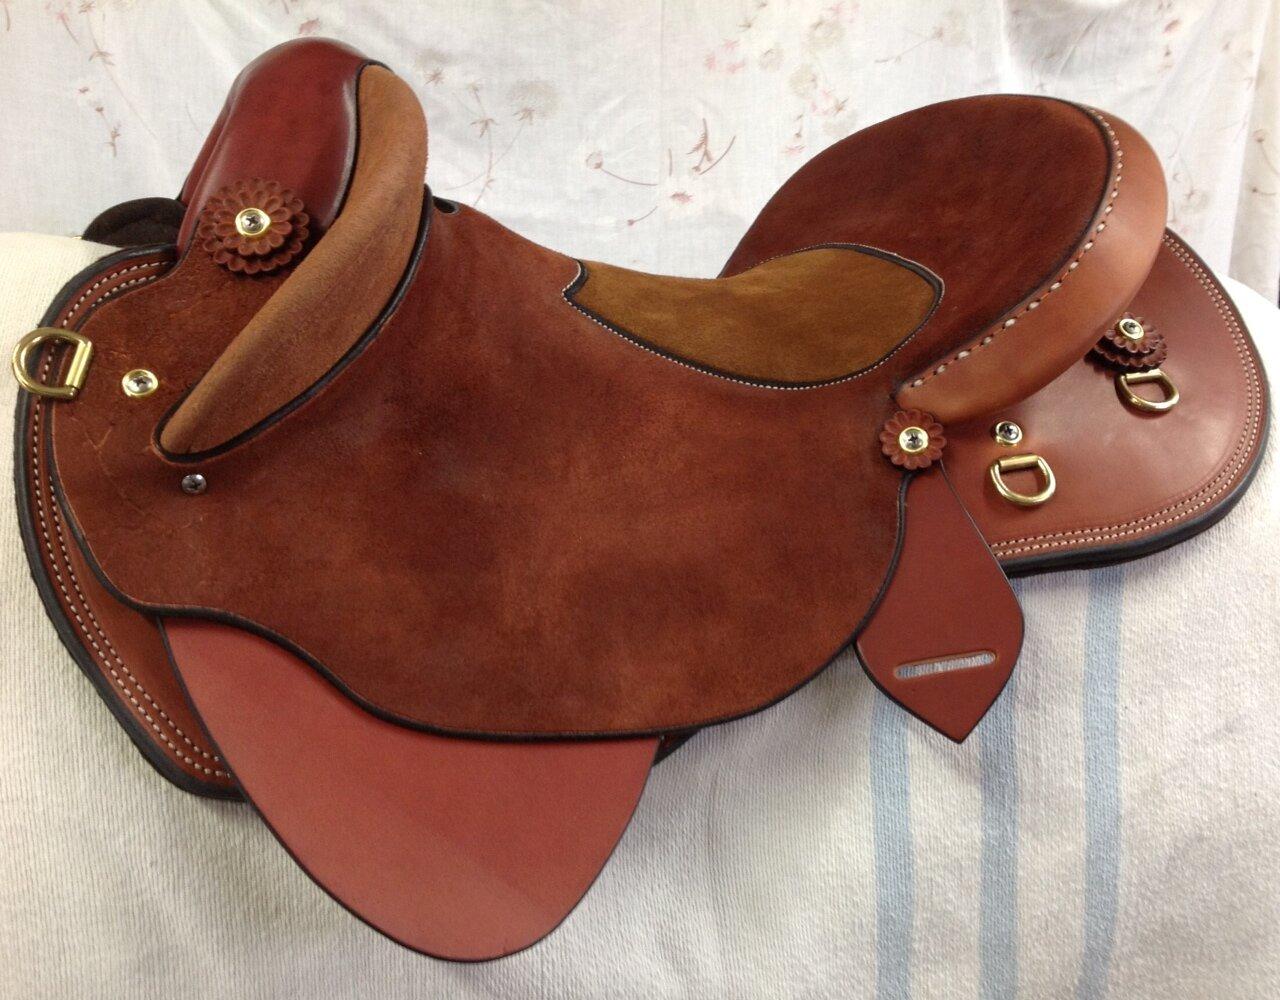 saddle for sale 2014.JPG